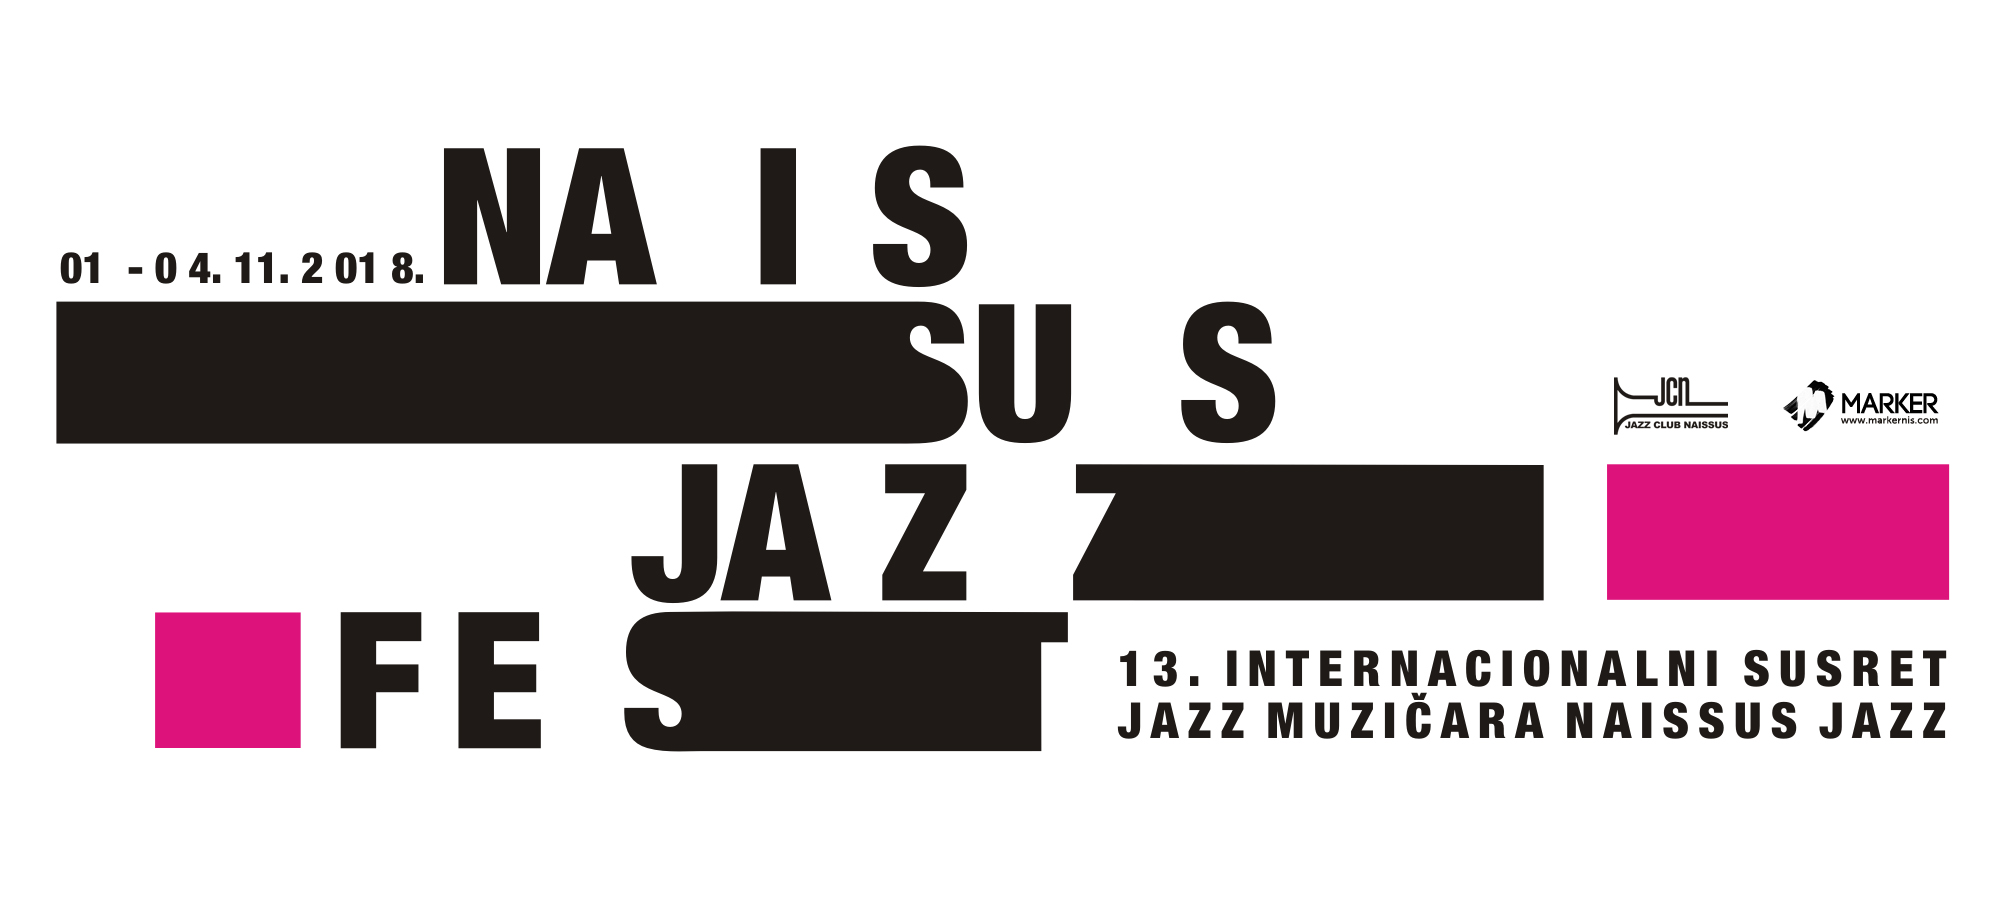 Naissus Jazz Festival